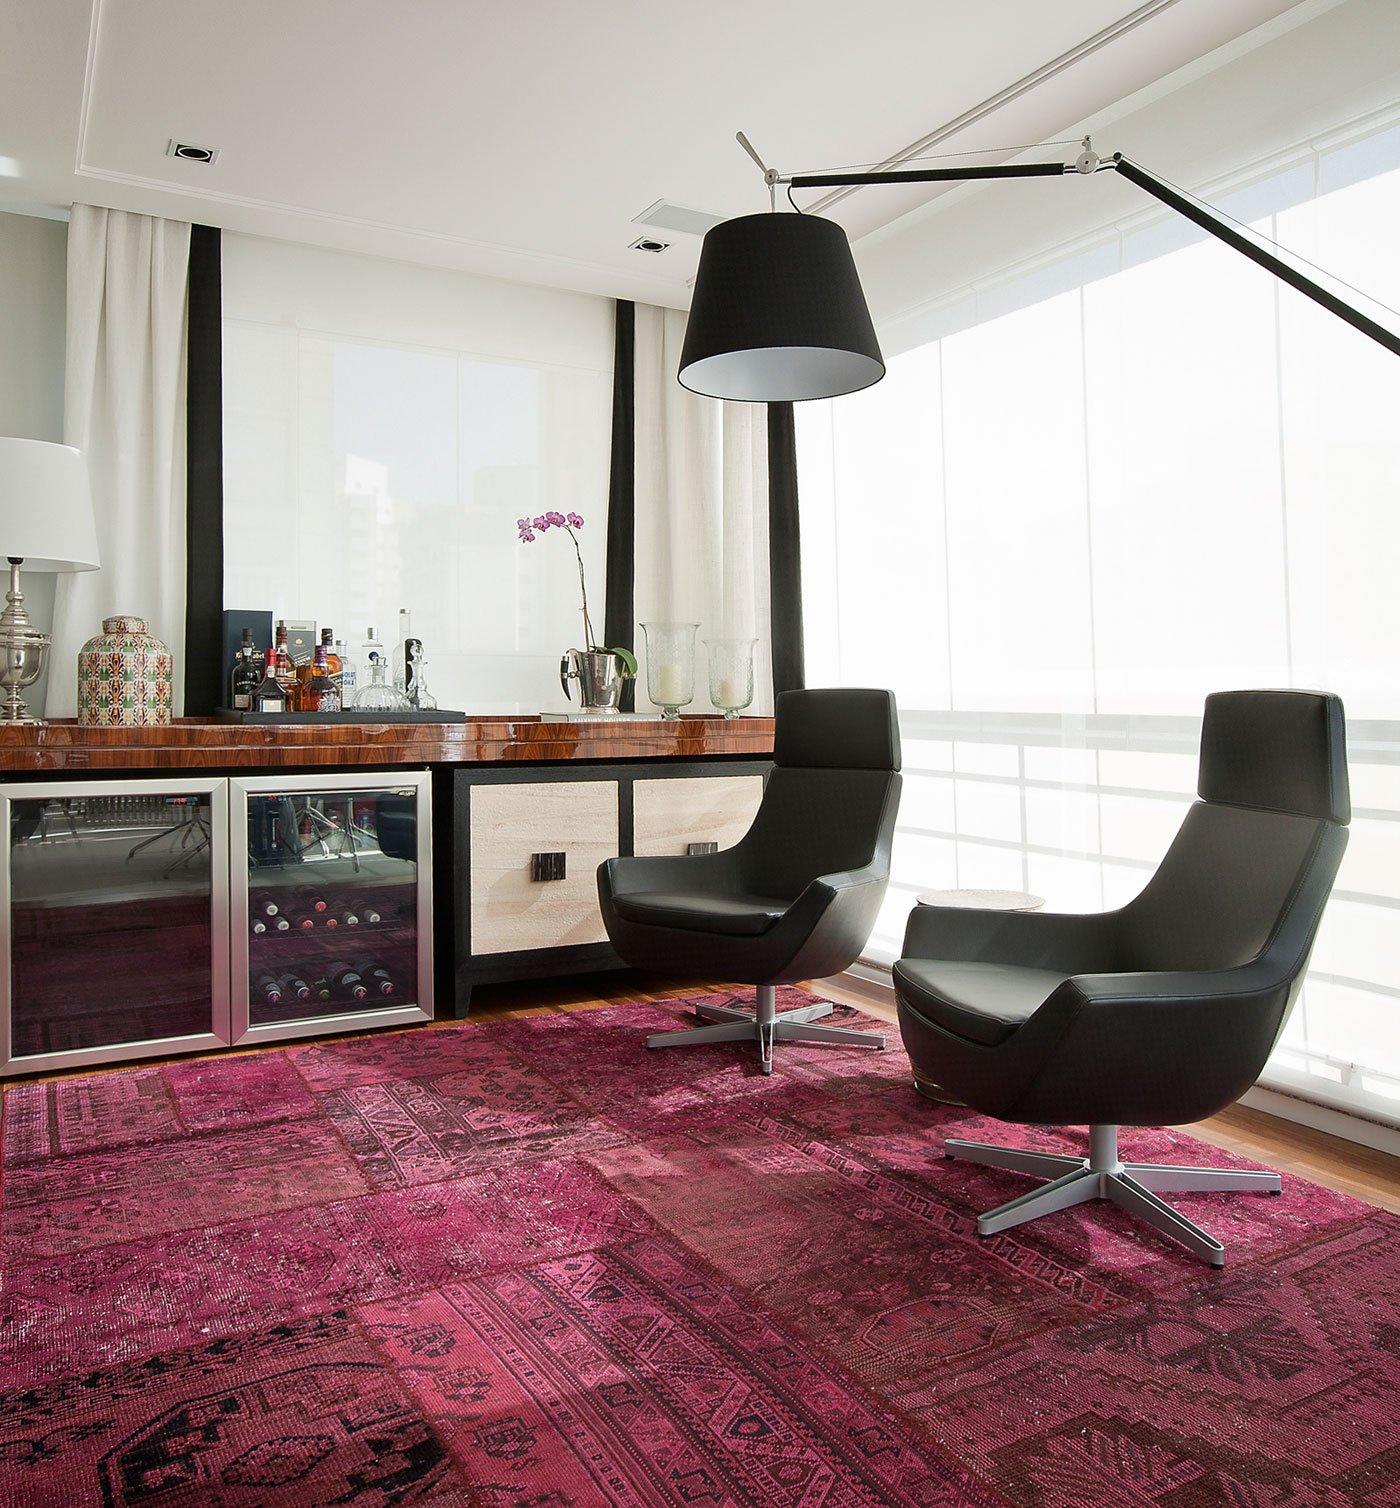 An-Elegant-Interior-11